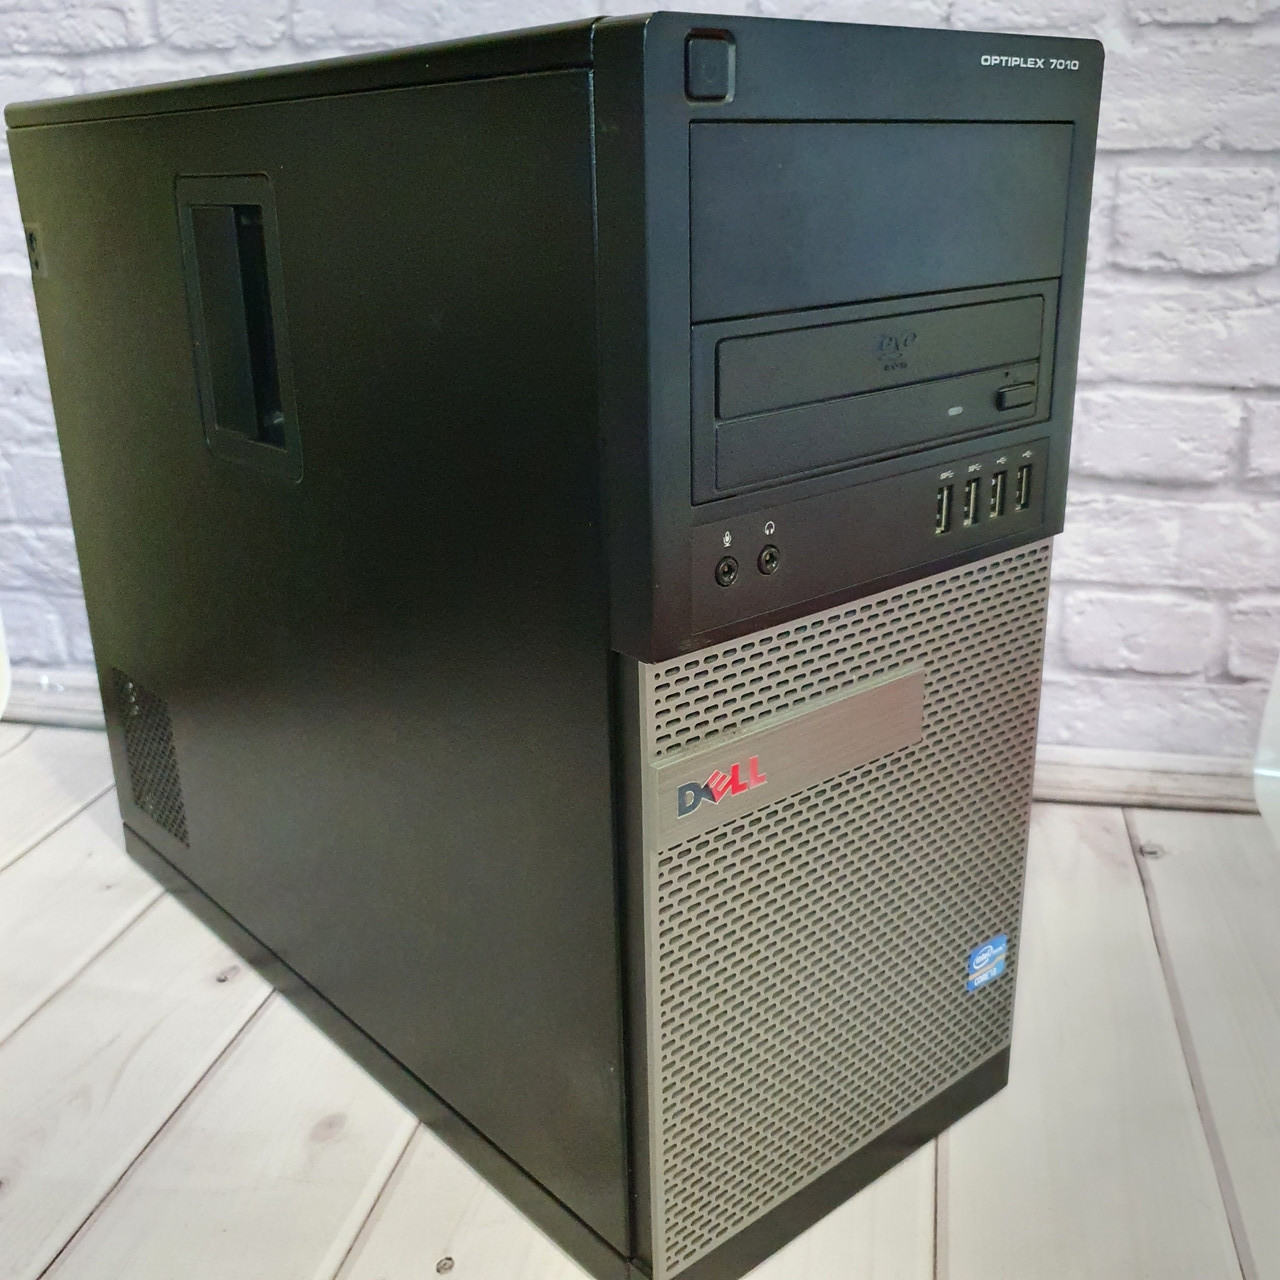 Системный блок Dell MT (Intel Core i5-45704x3.60Ghz/8Gb DDR3/HDD 250Gb/DVD)